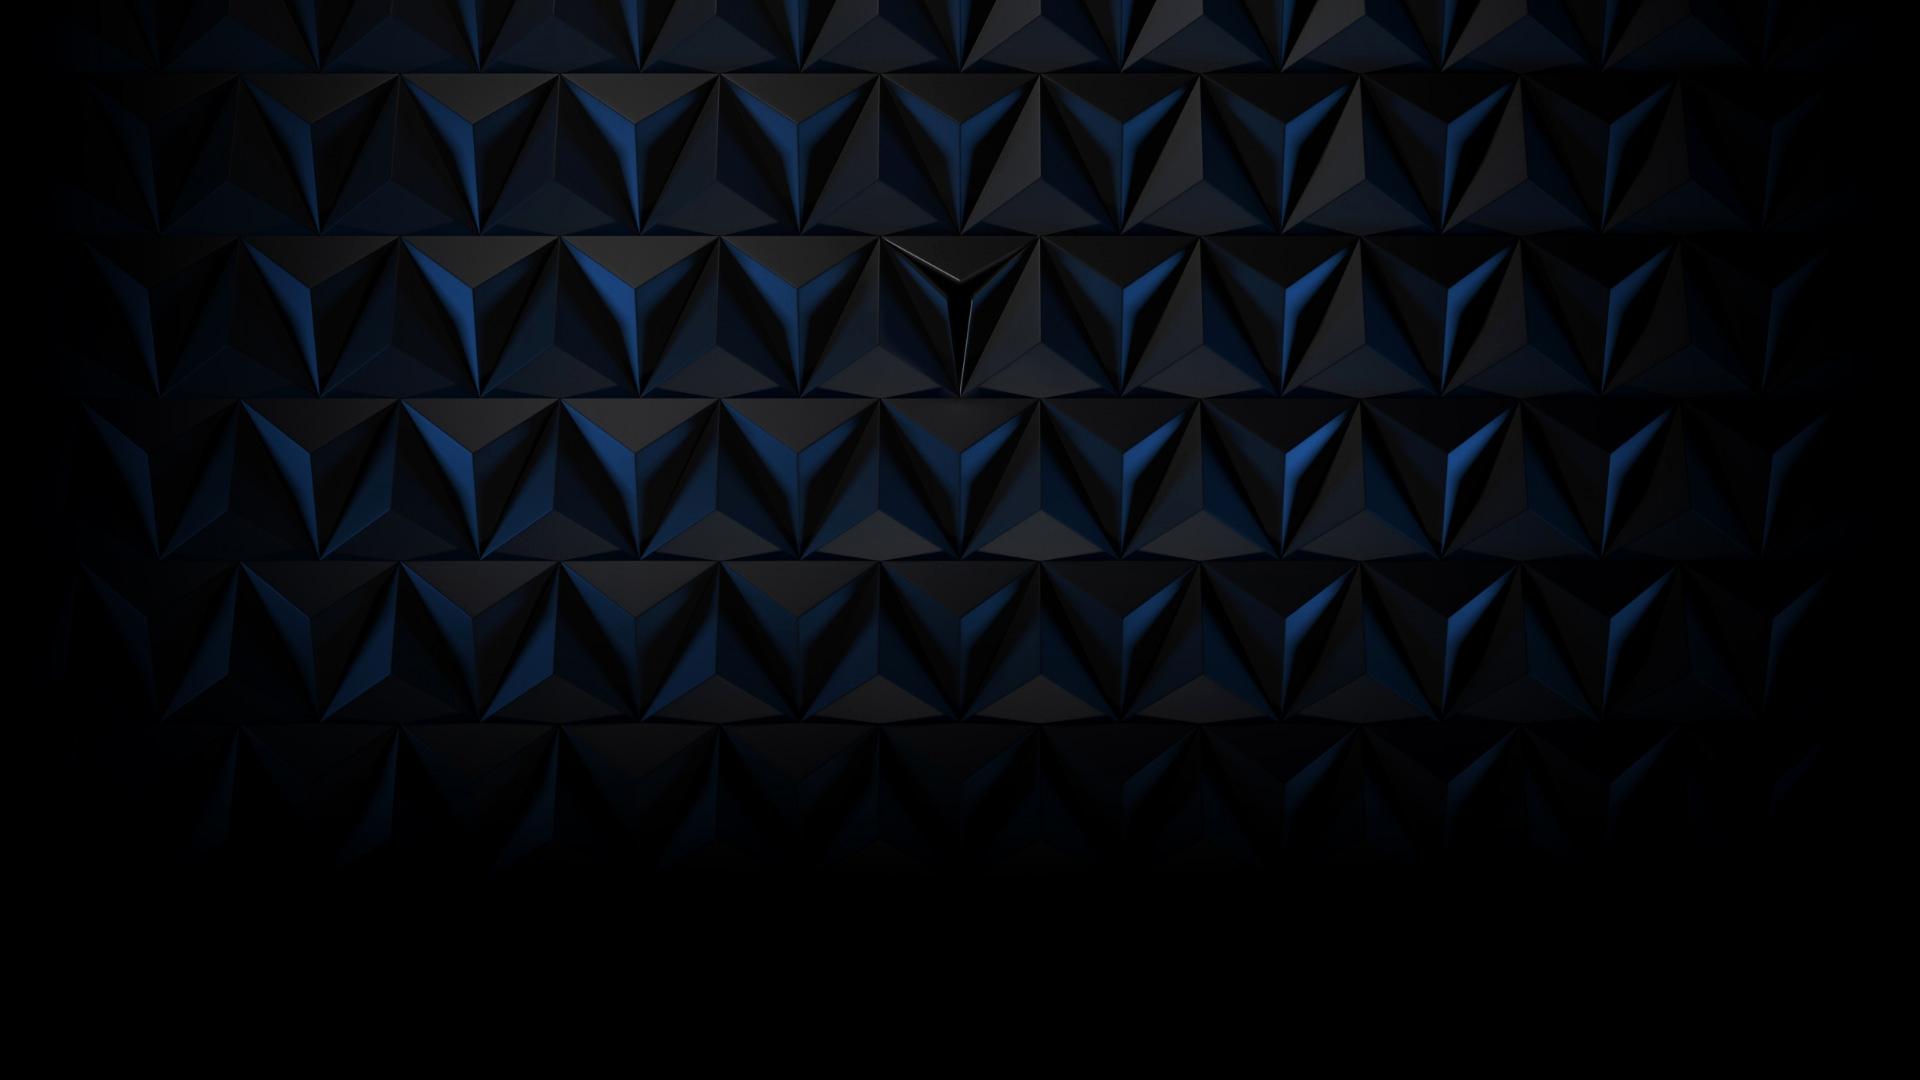 Lenovo Legion Fond D Ecran Bleu Fond D Ecran Lenovo 1920x1080 Wallpapertip